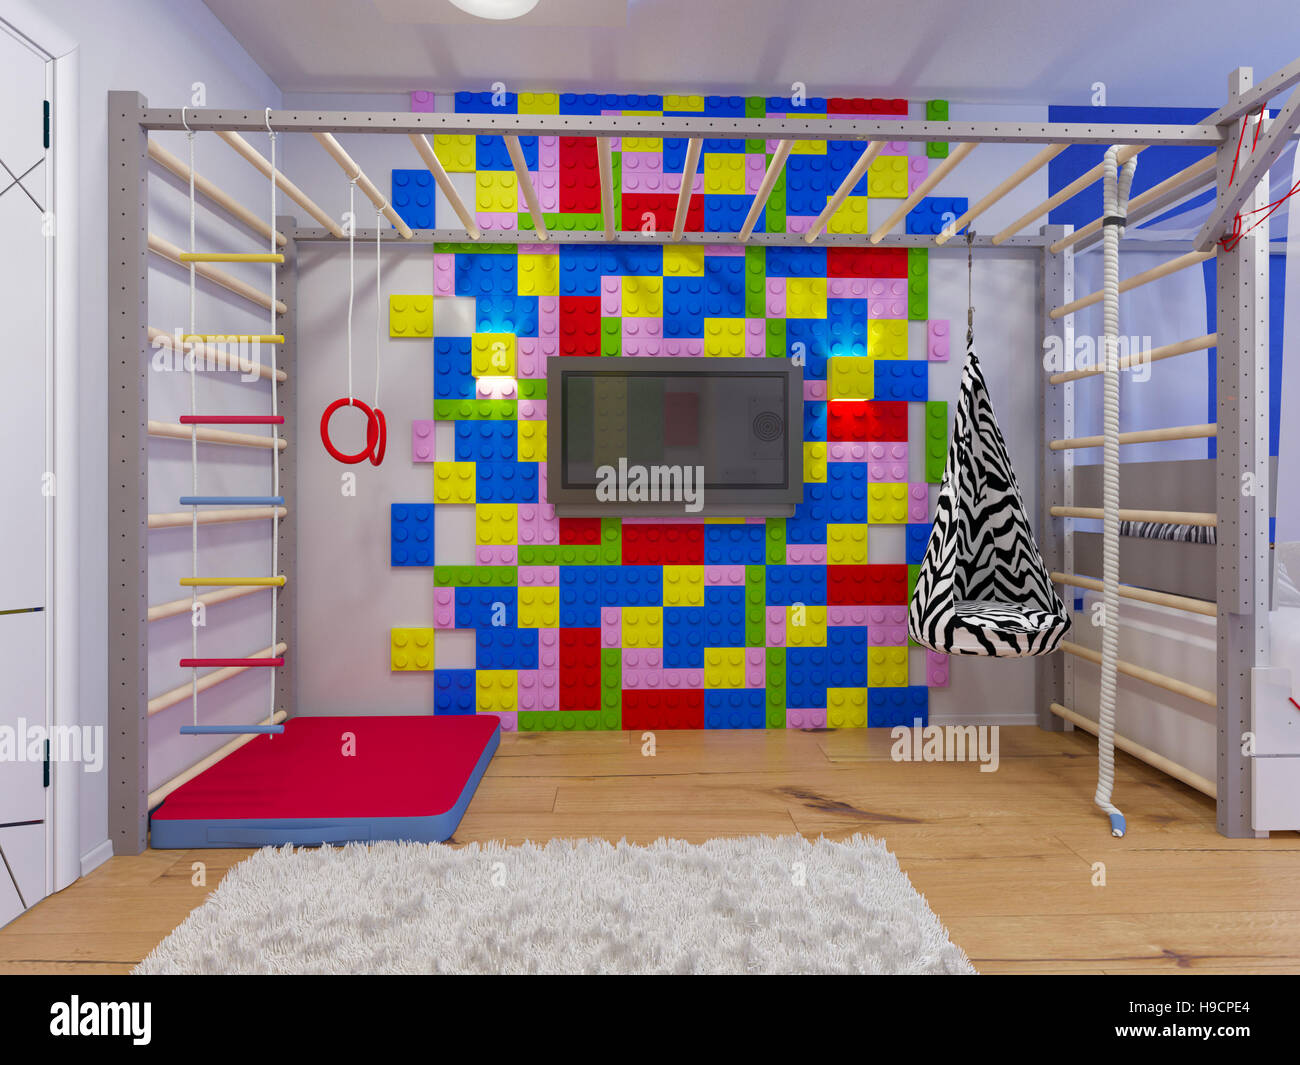 3d illustration of interior design childrens room for a boy in